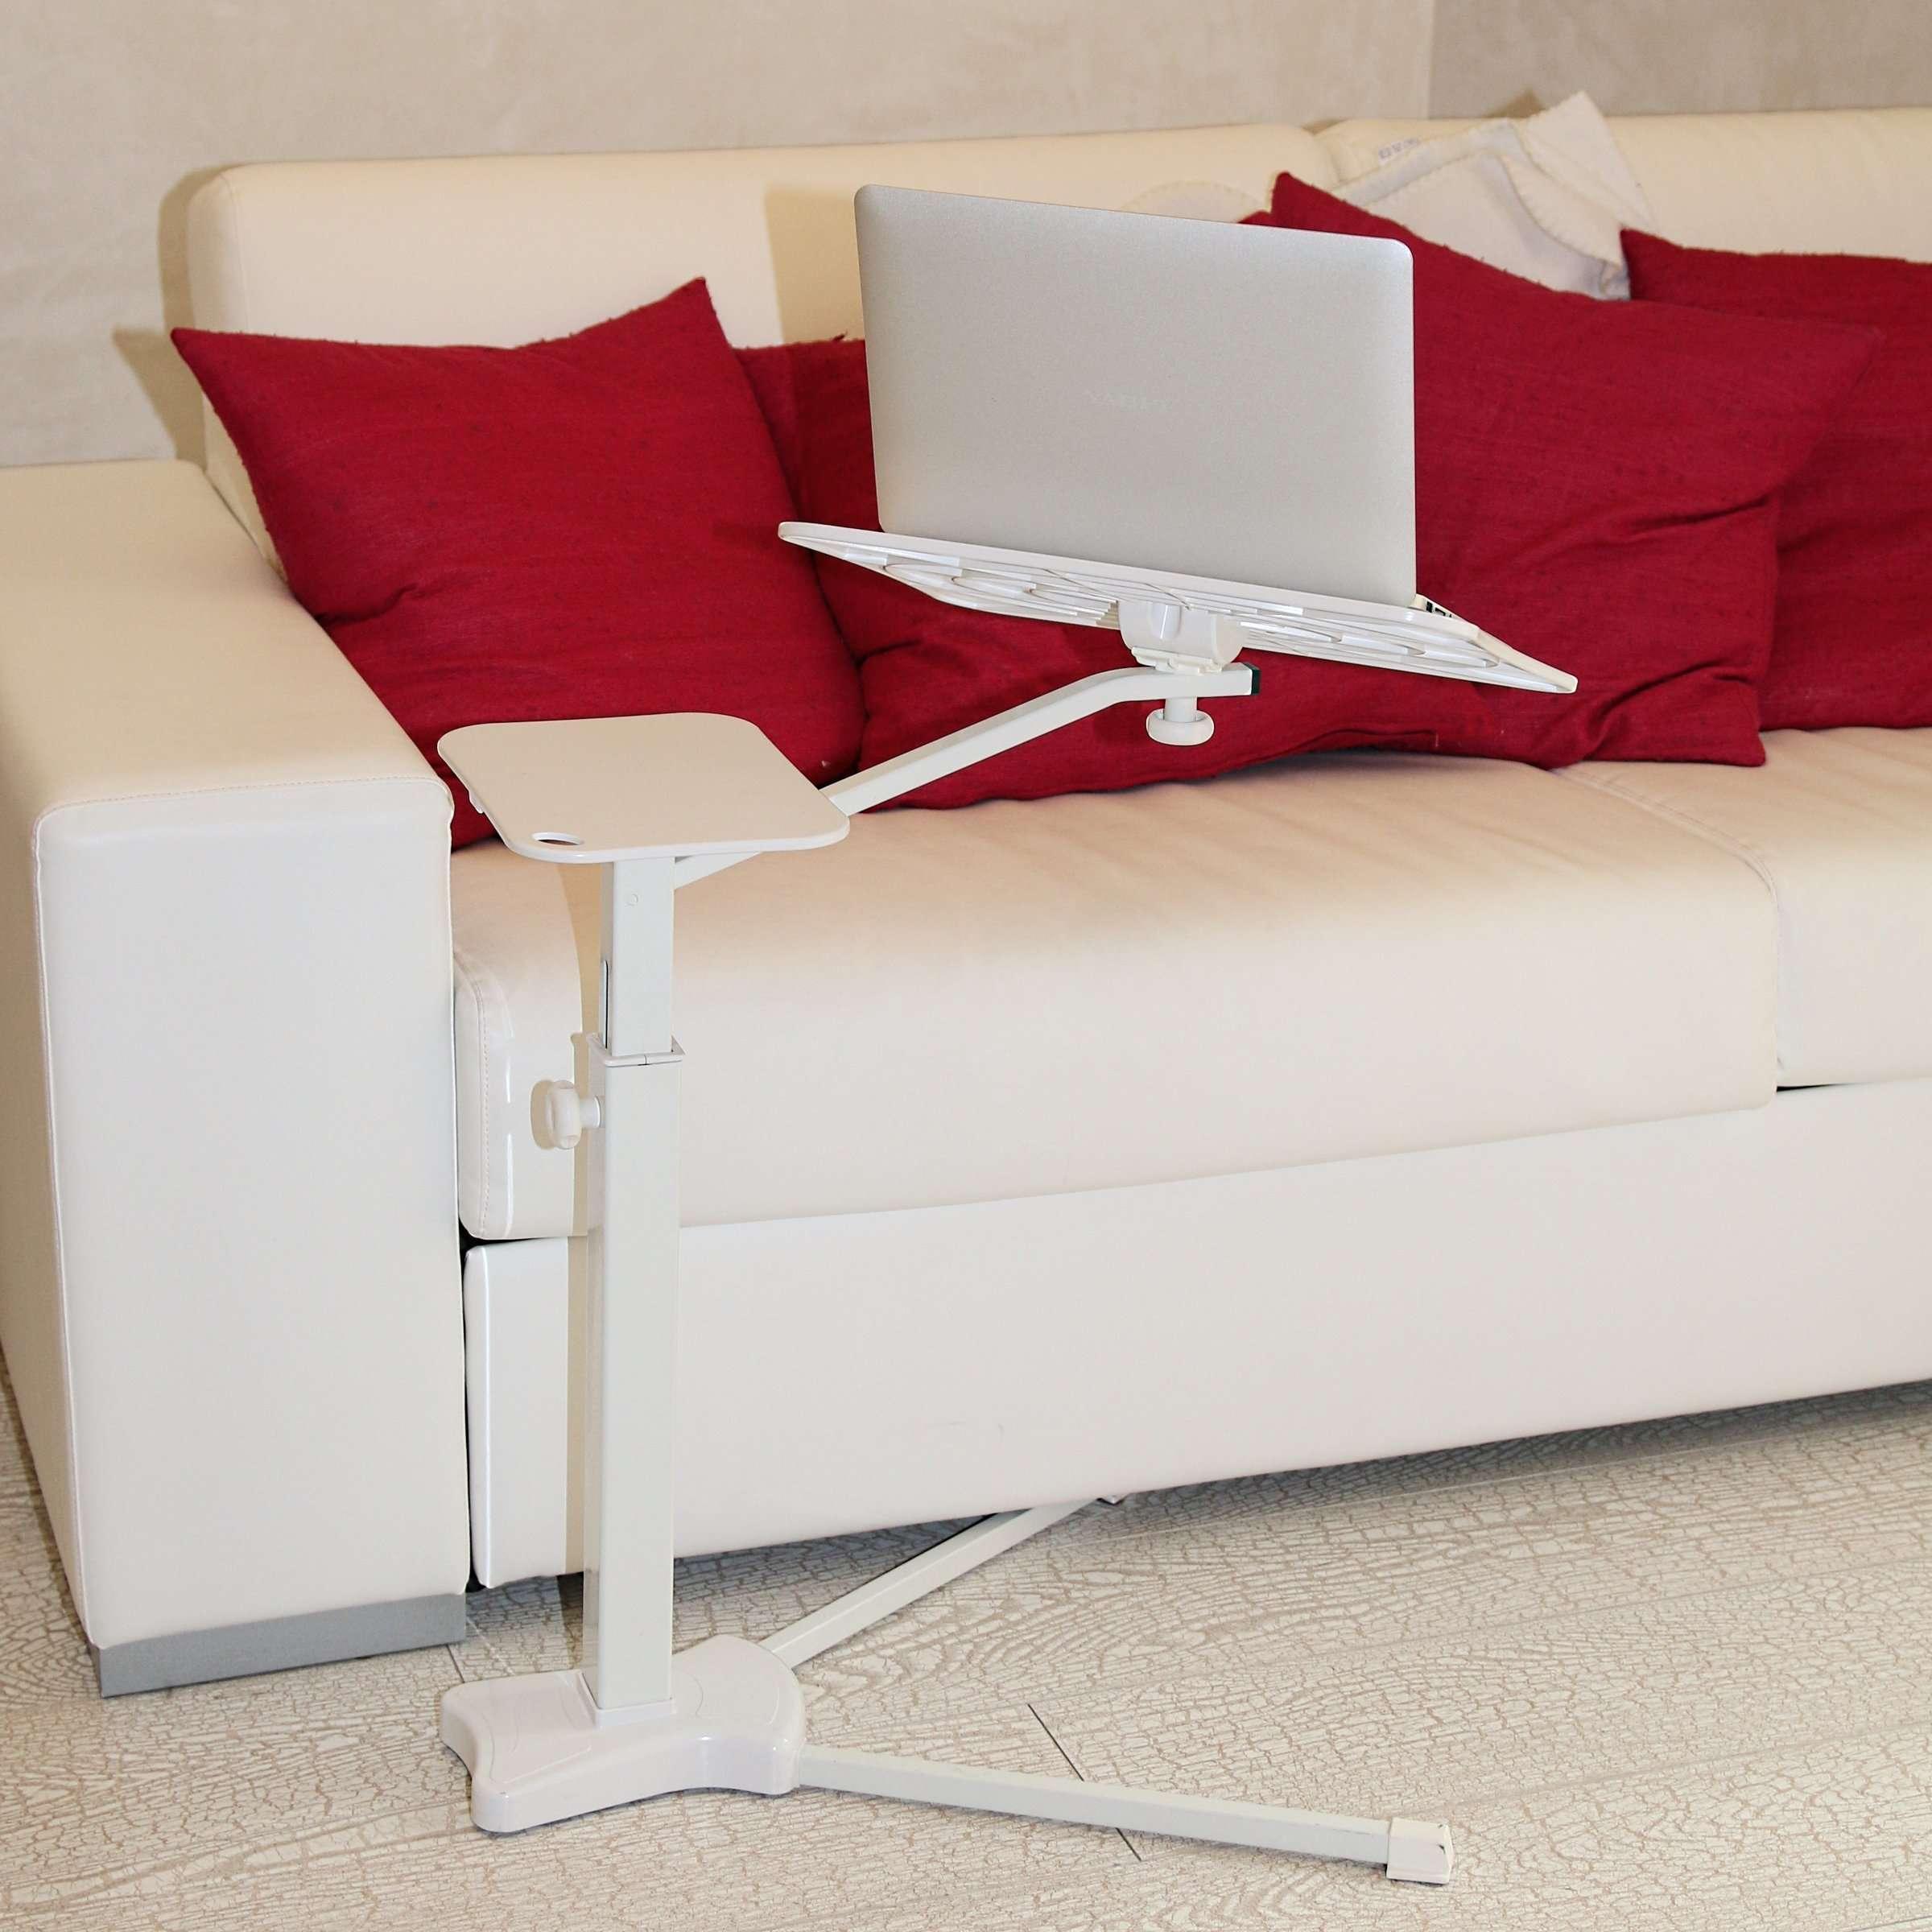 portanotebook minimalista per interni design